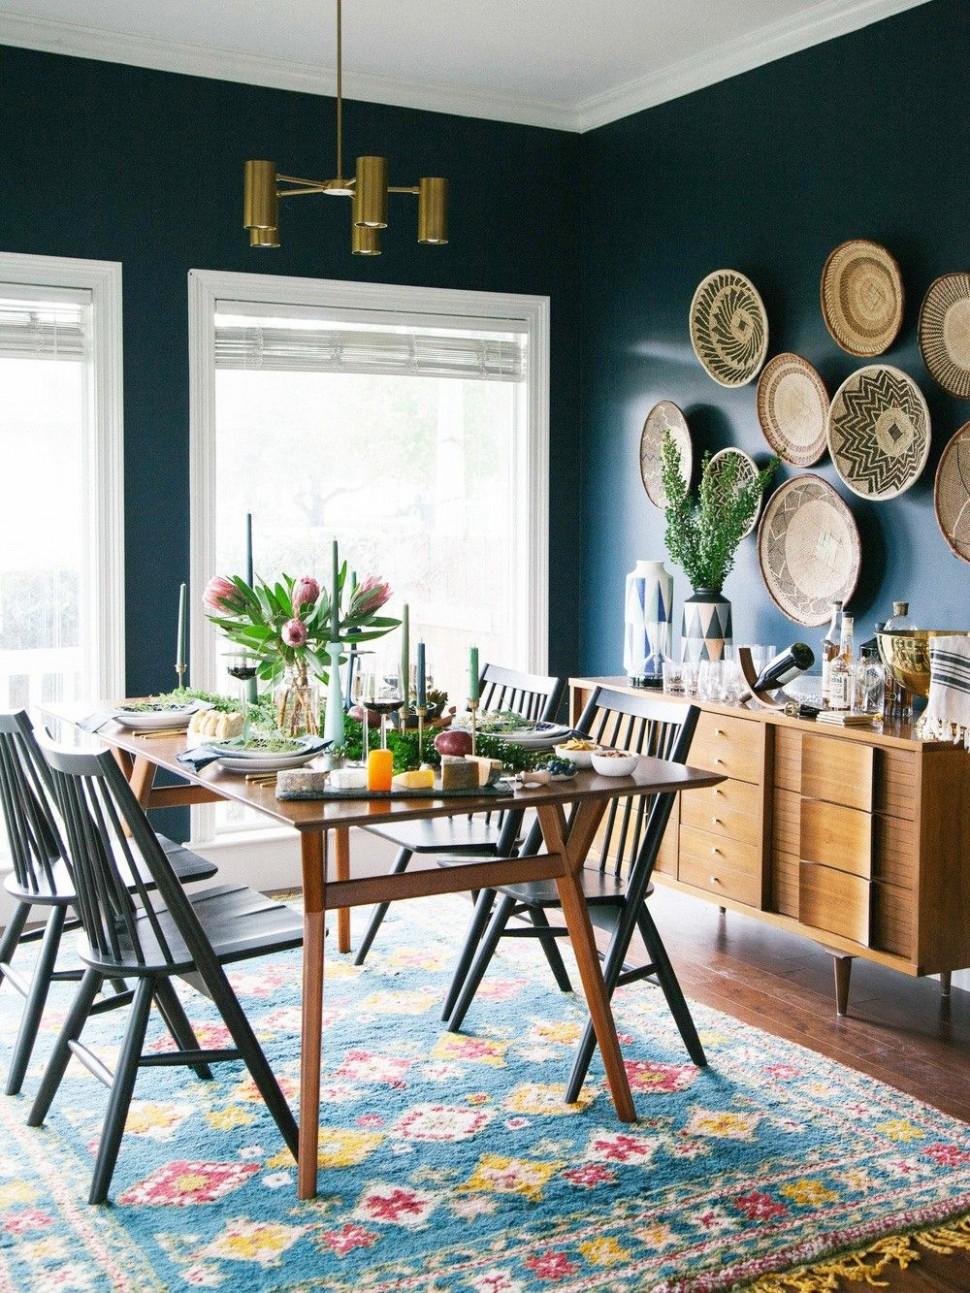 9 Beautiful Bohemian Dining Rooms We Love  Dining room blue  - Dining Room Ideas Retro